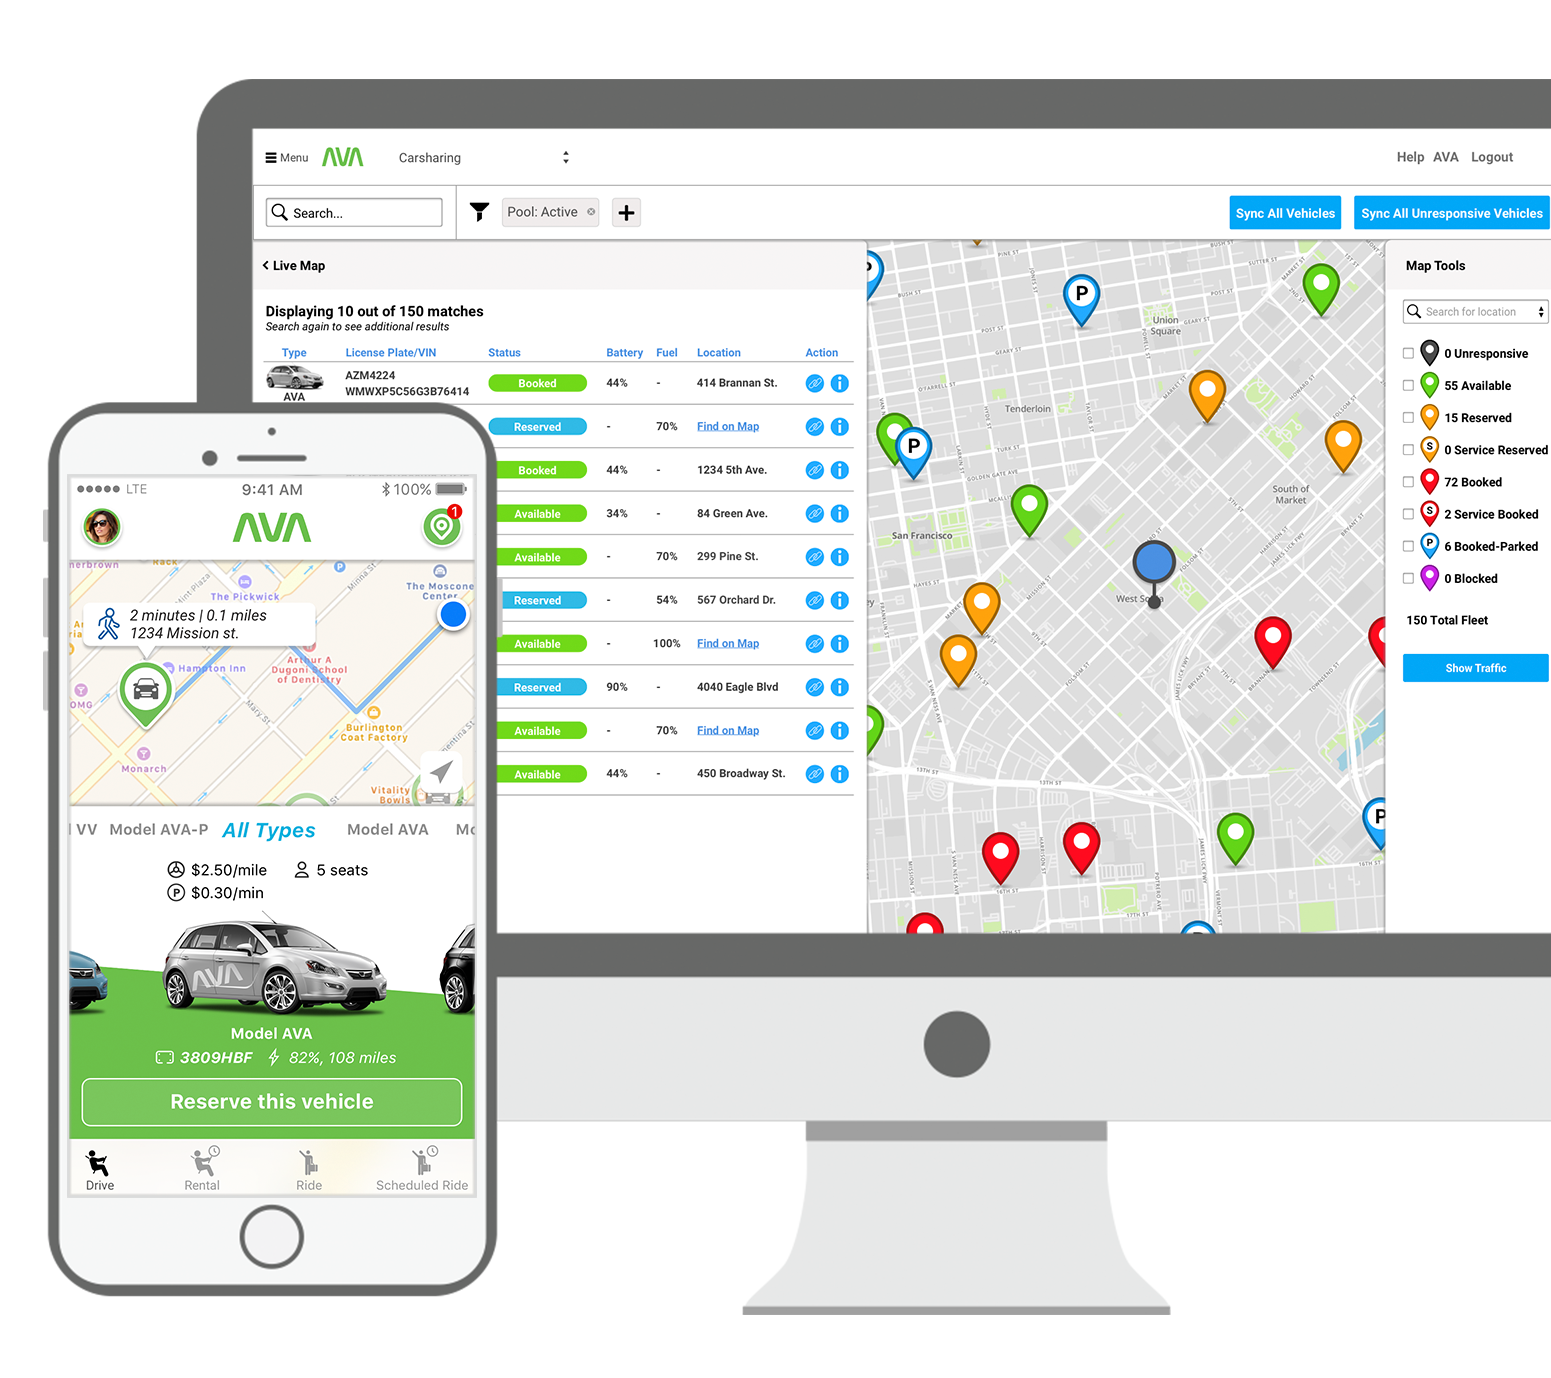 Ridecell's carsharing app